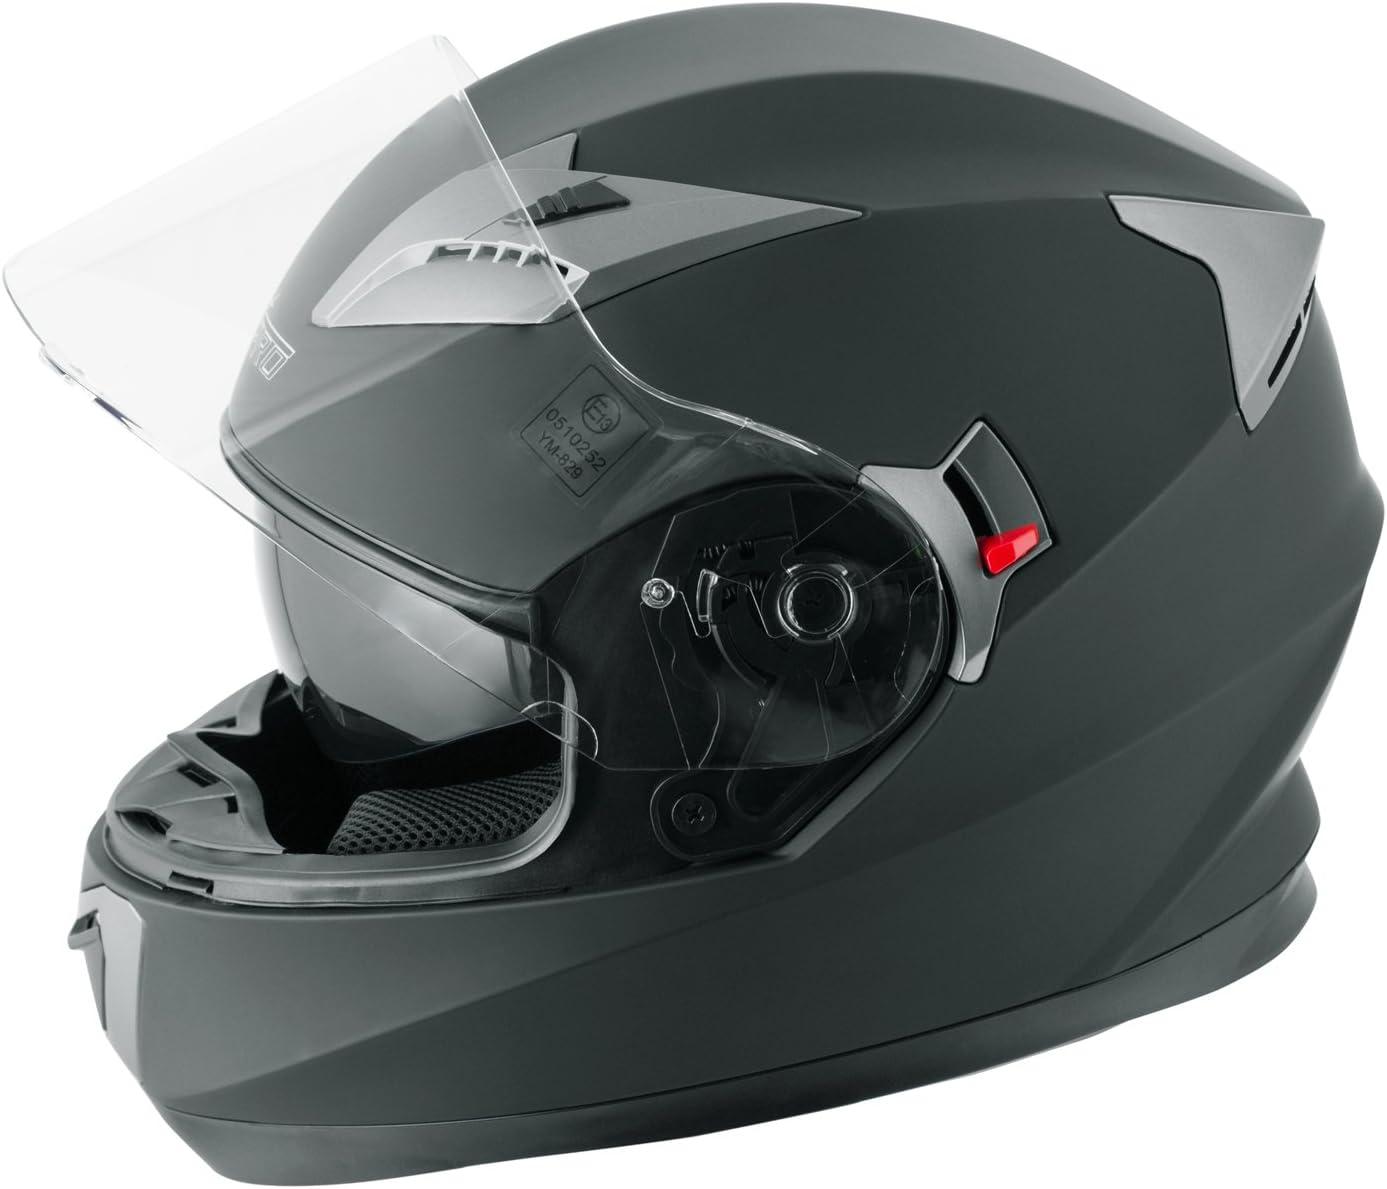 A-Pro Integralhelm Motorradhelm Rollerhelm Sonnenblende Helm Weiss S